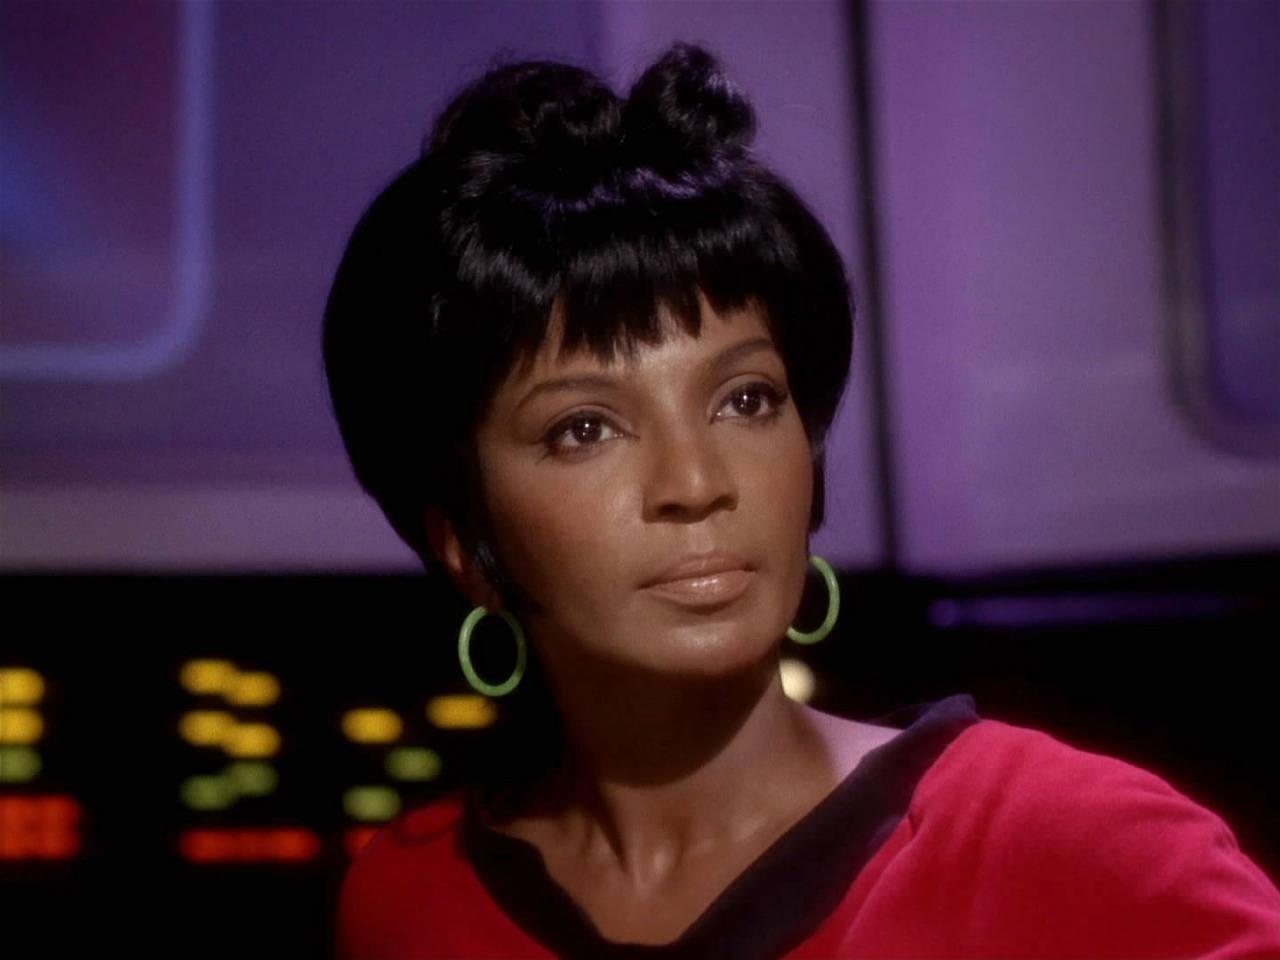 Nichelle Nichols as Lieutenant Uhura